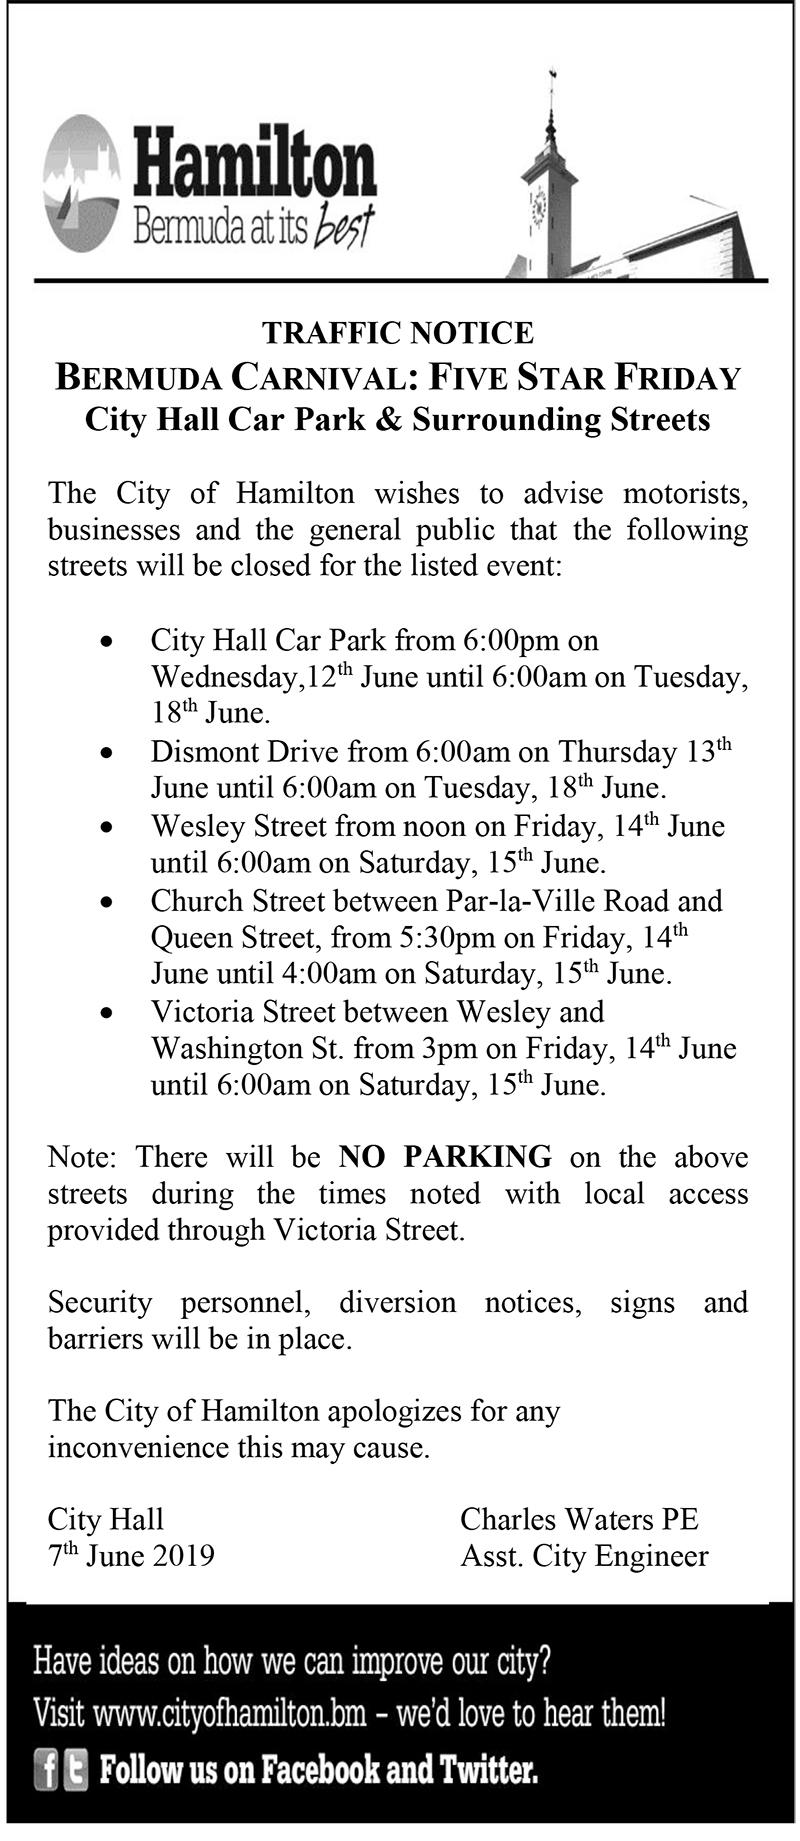 Traffic Notice - Bermuda Carnival Five Star Friday June 2019